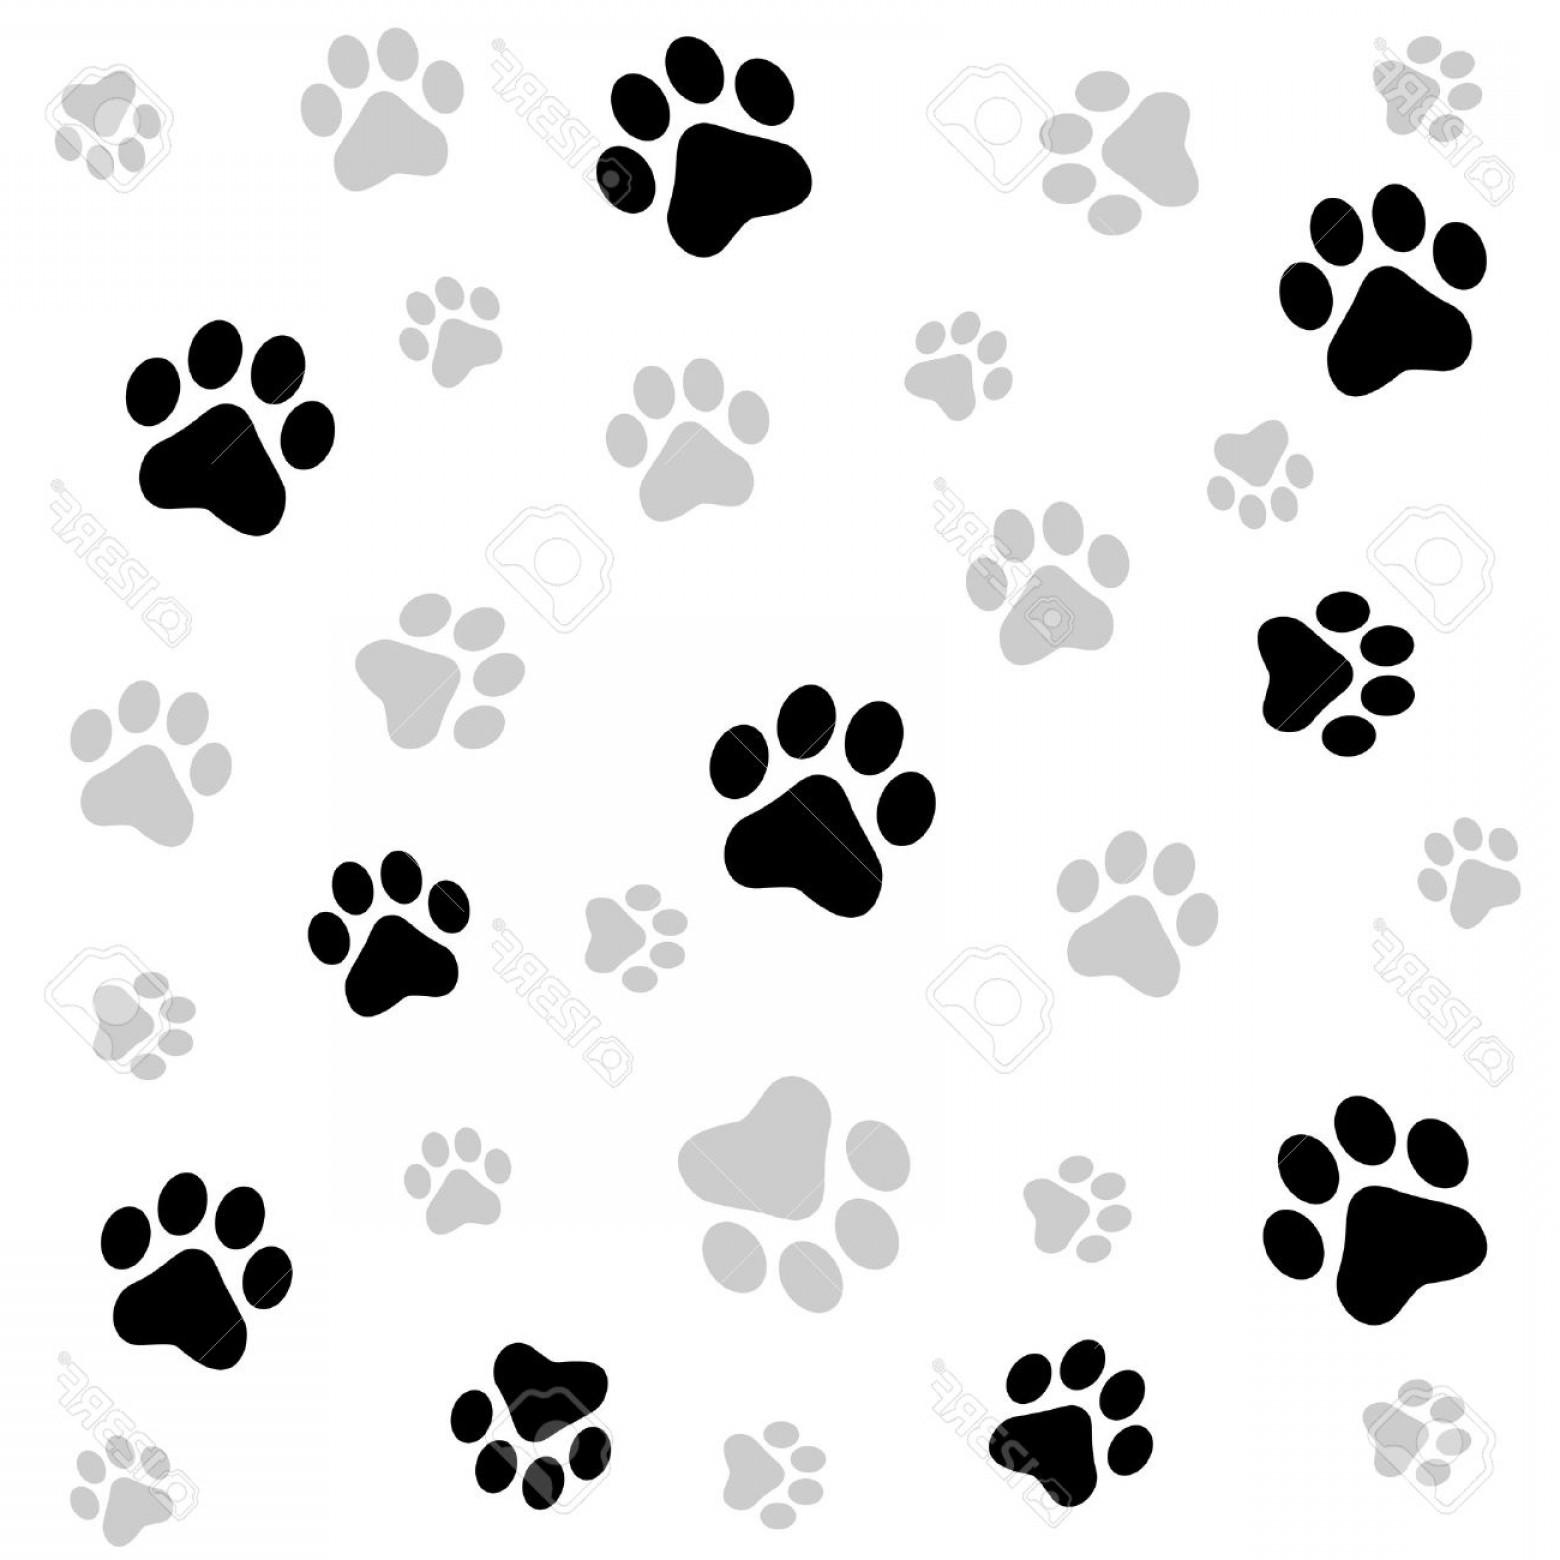 1560x1560 Photostock Vector Dog Paw Print Seamless Pattern On White